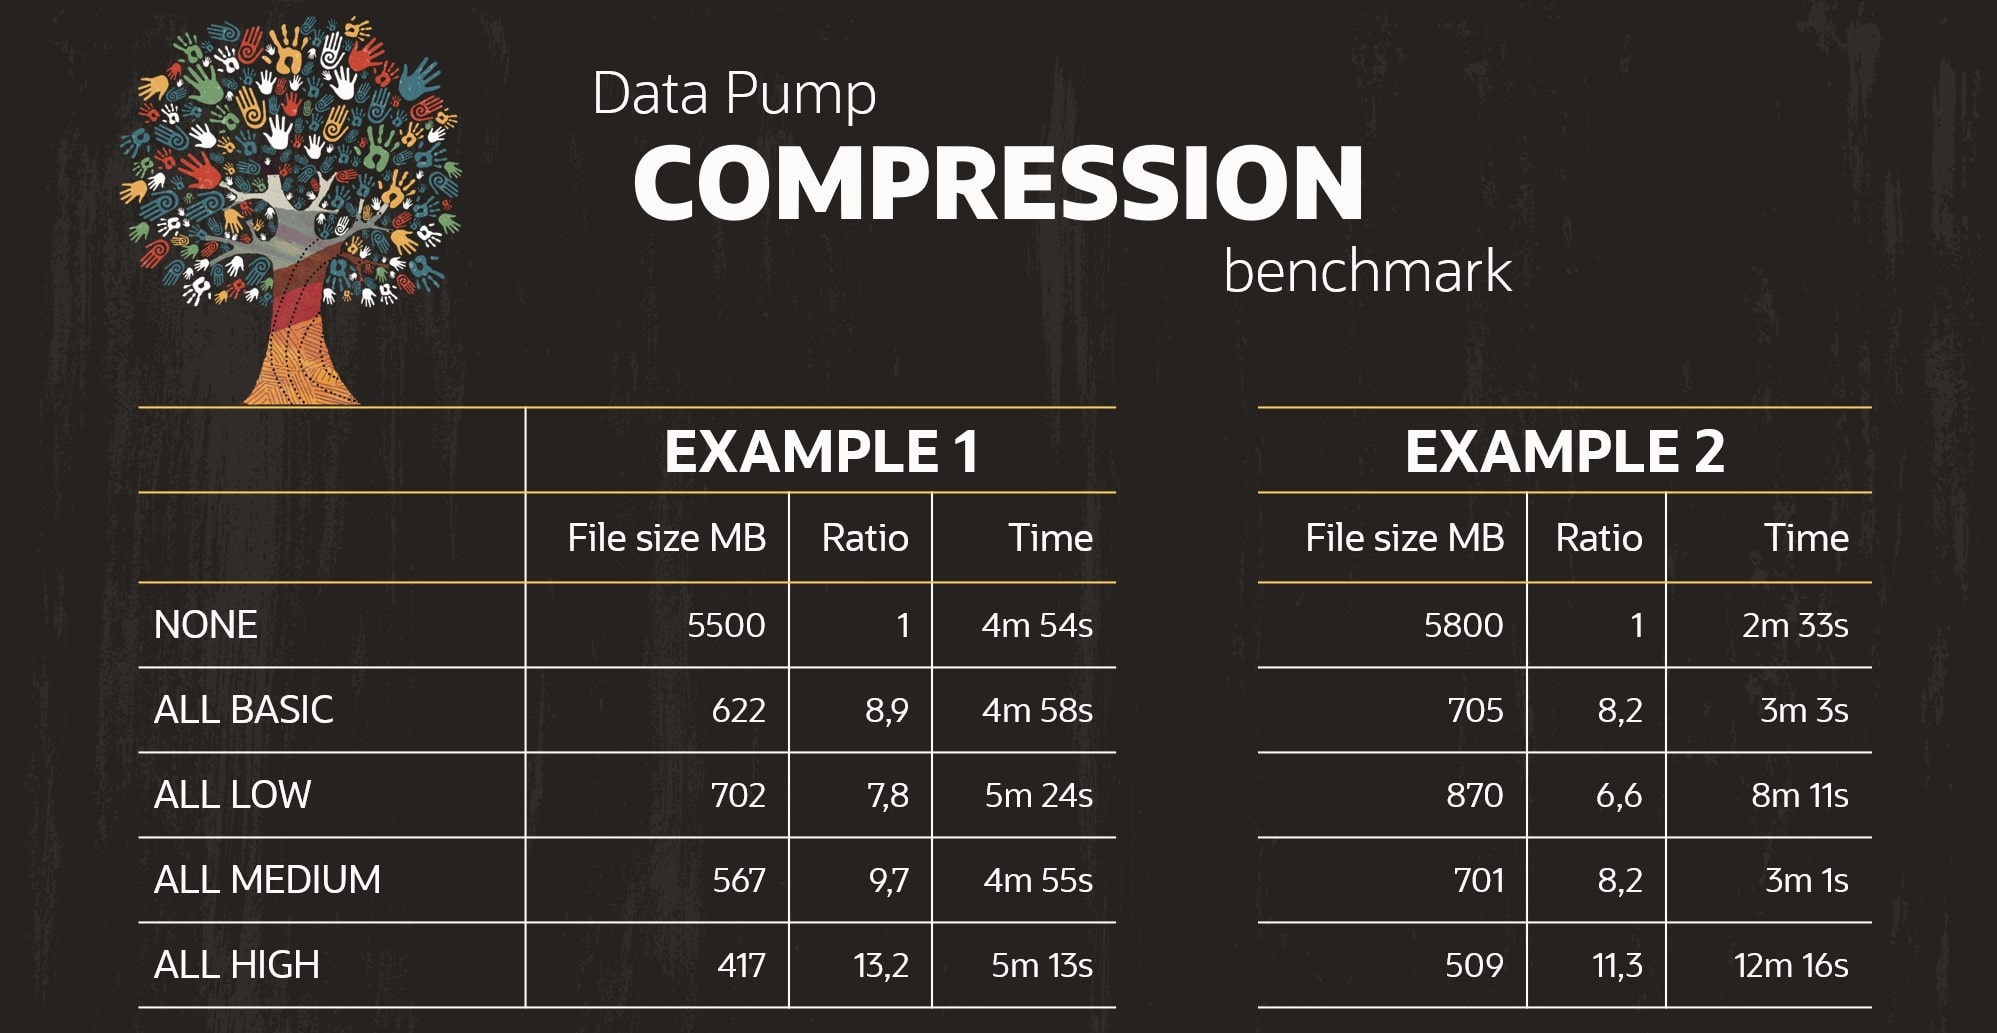 Comparing Data Pump compression algorithms